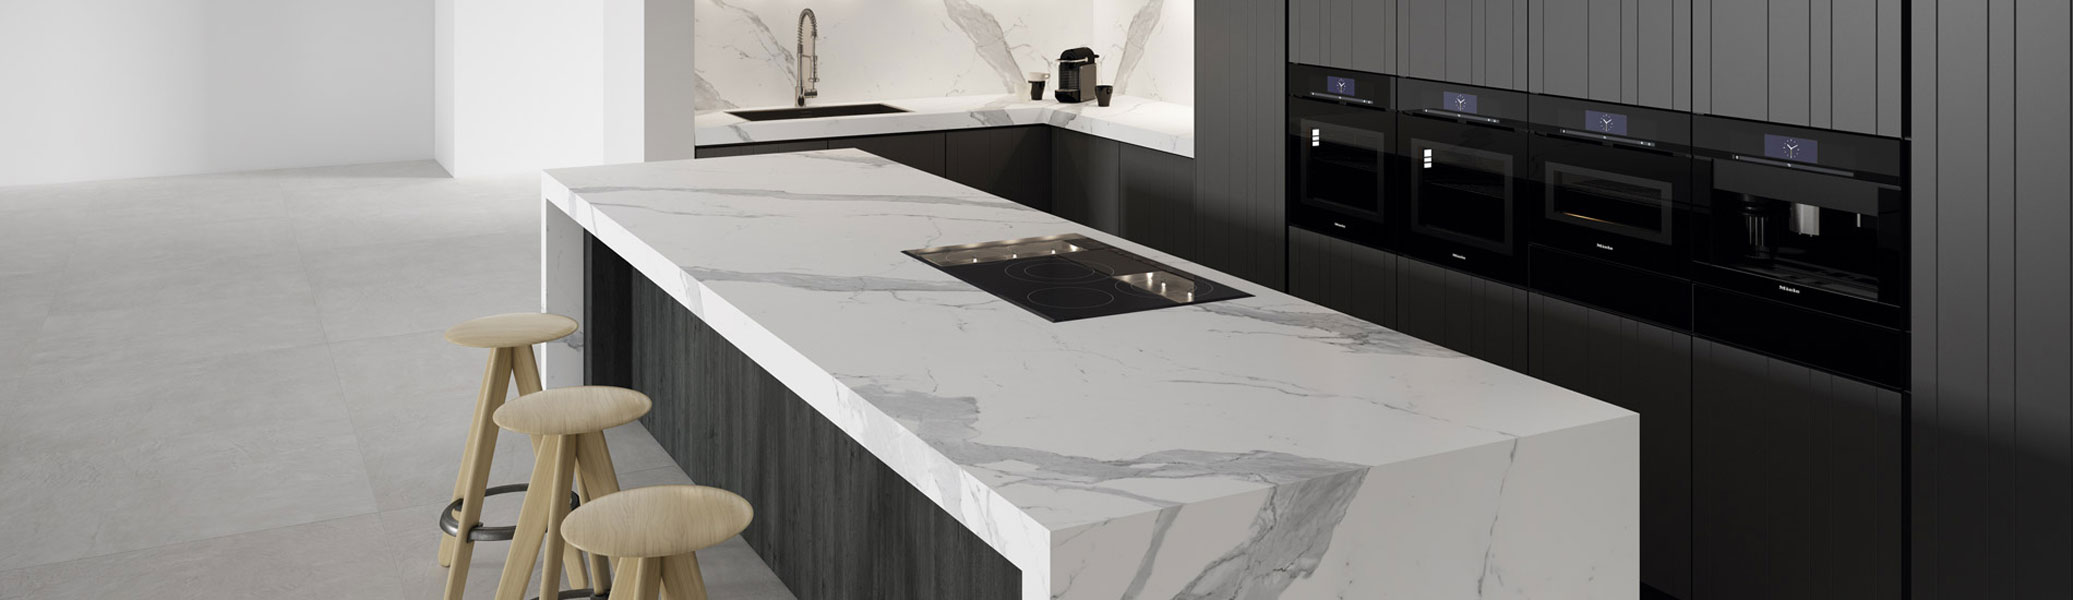 Banner-64x128-Porcelain-Countertop-Slabs-Anaheim